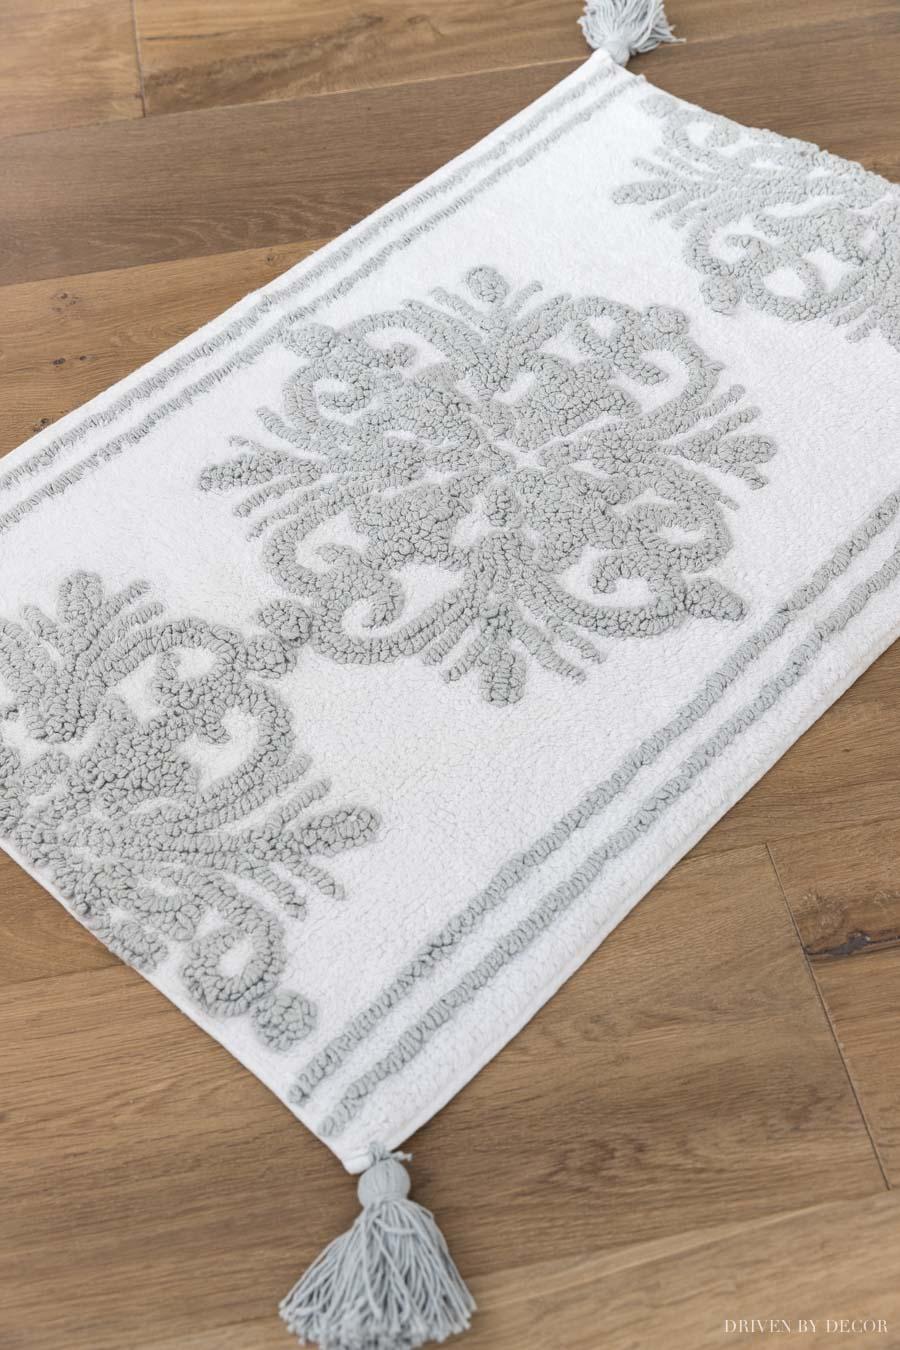 Beautiful gray and white bath mat with tasseled corners!